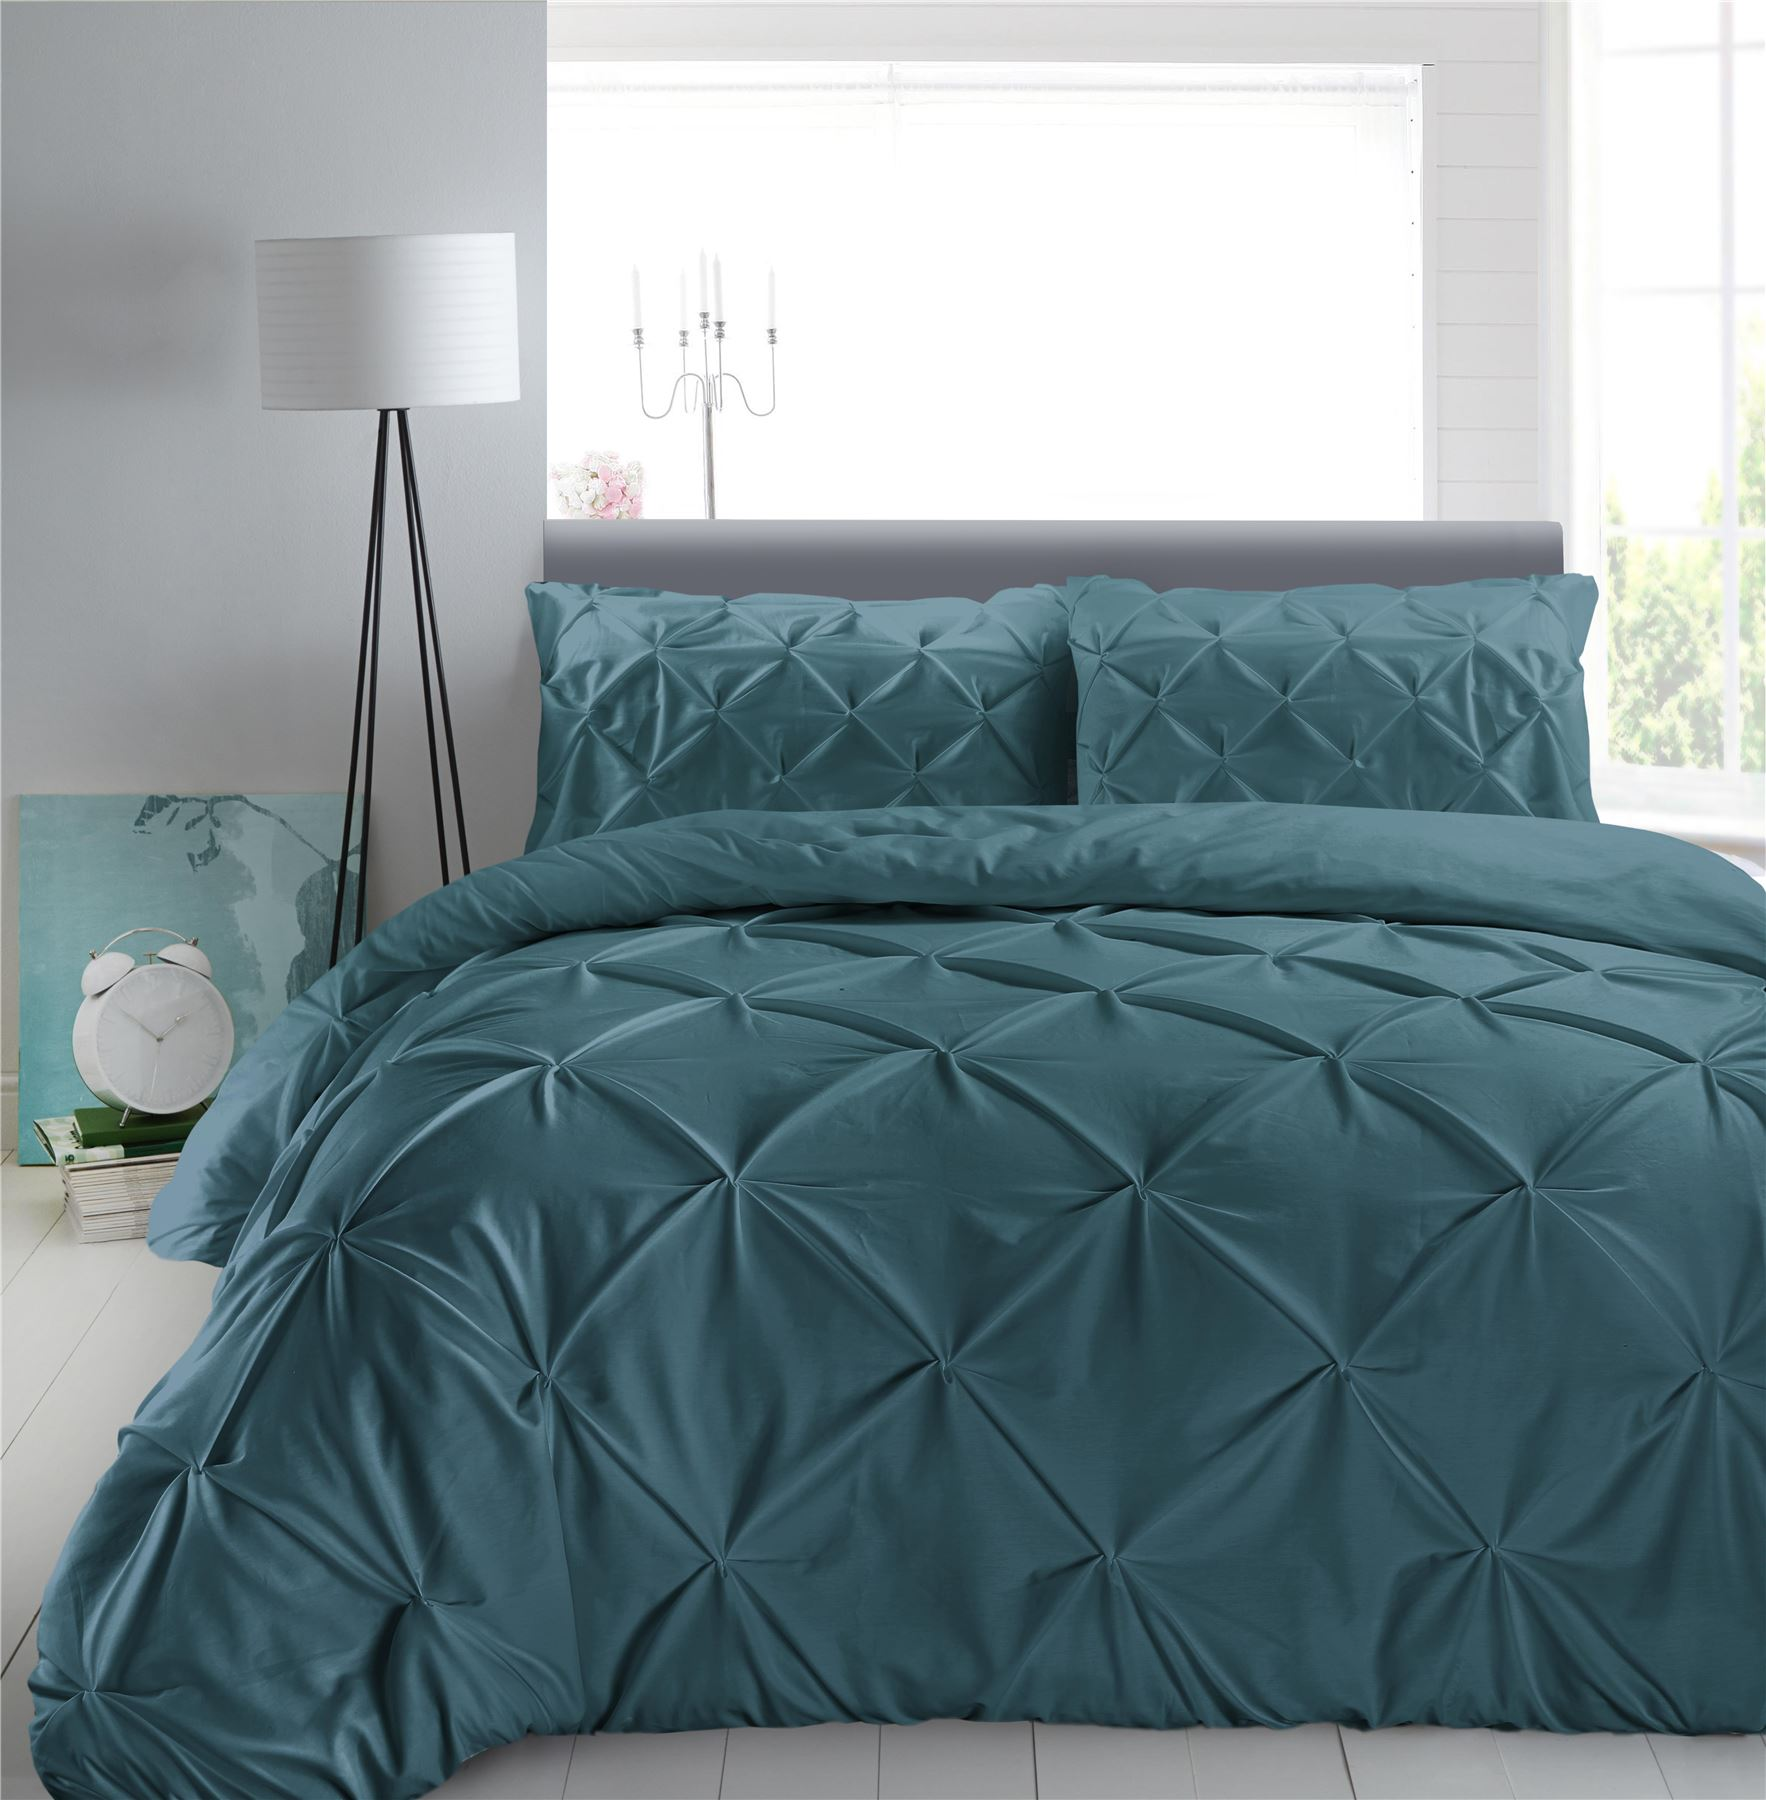 Luxury-Pure-100-Cotton-200-Thread-Pinch-Pleat-Pintuck-Puckering-Duvet-Cover-Set thumbnail 62